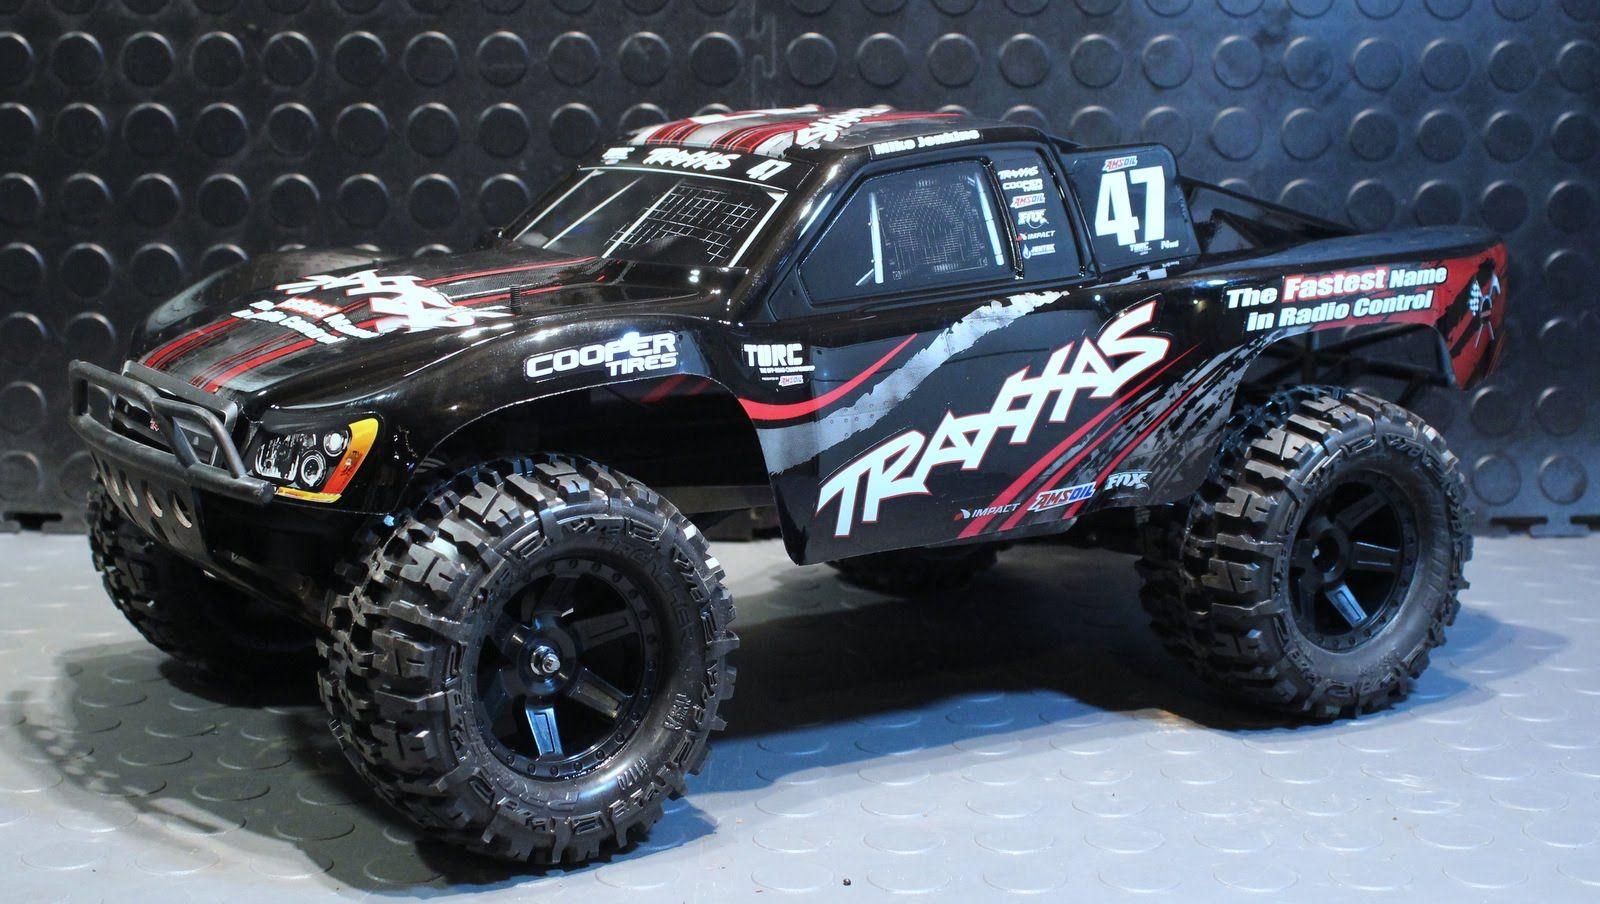 Best 25 traxxas slash ideas on pinterest traxxas slash 4x4 body rc cars and traxxas slash 2wd